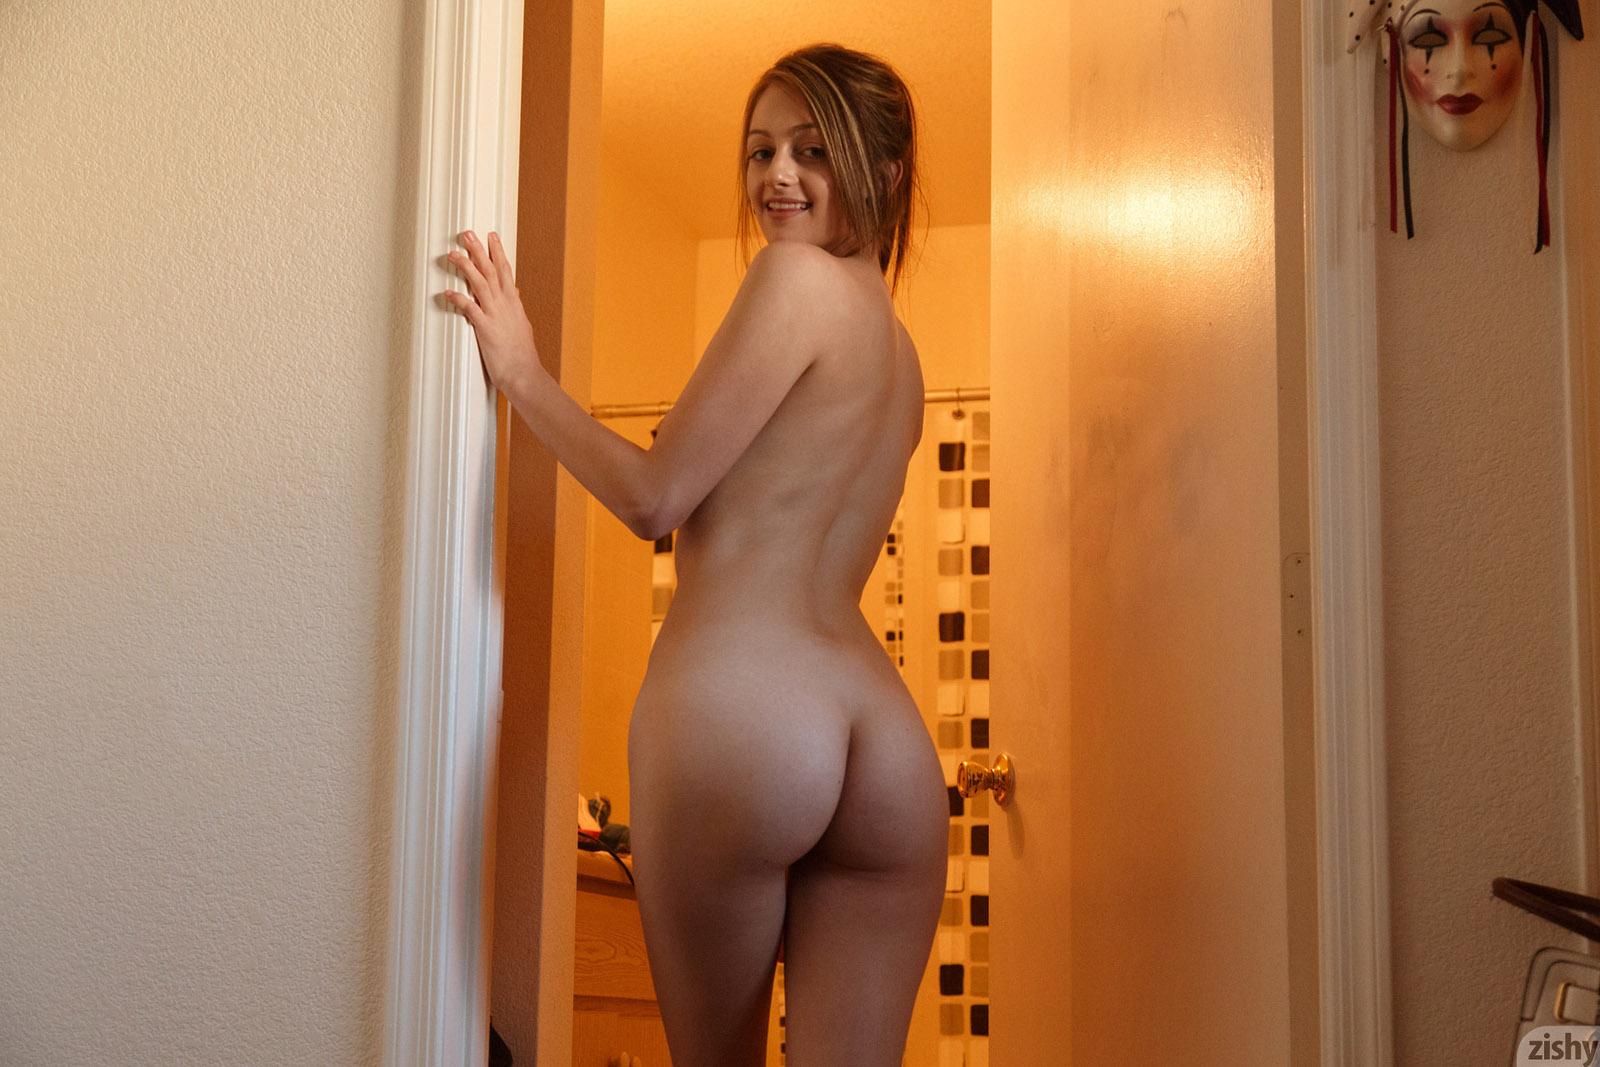 Dahlia Polk Small Town Girl Zishy nude pics - Bunnylust.com